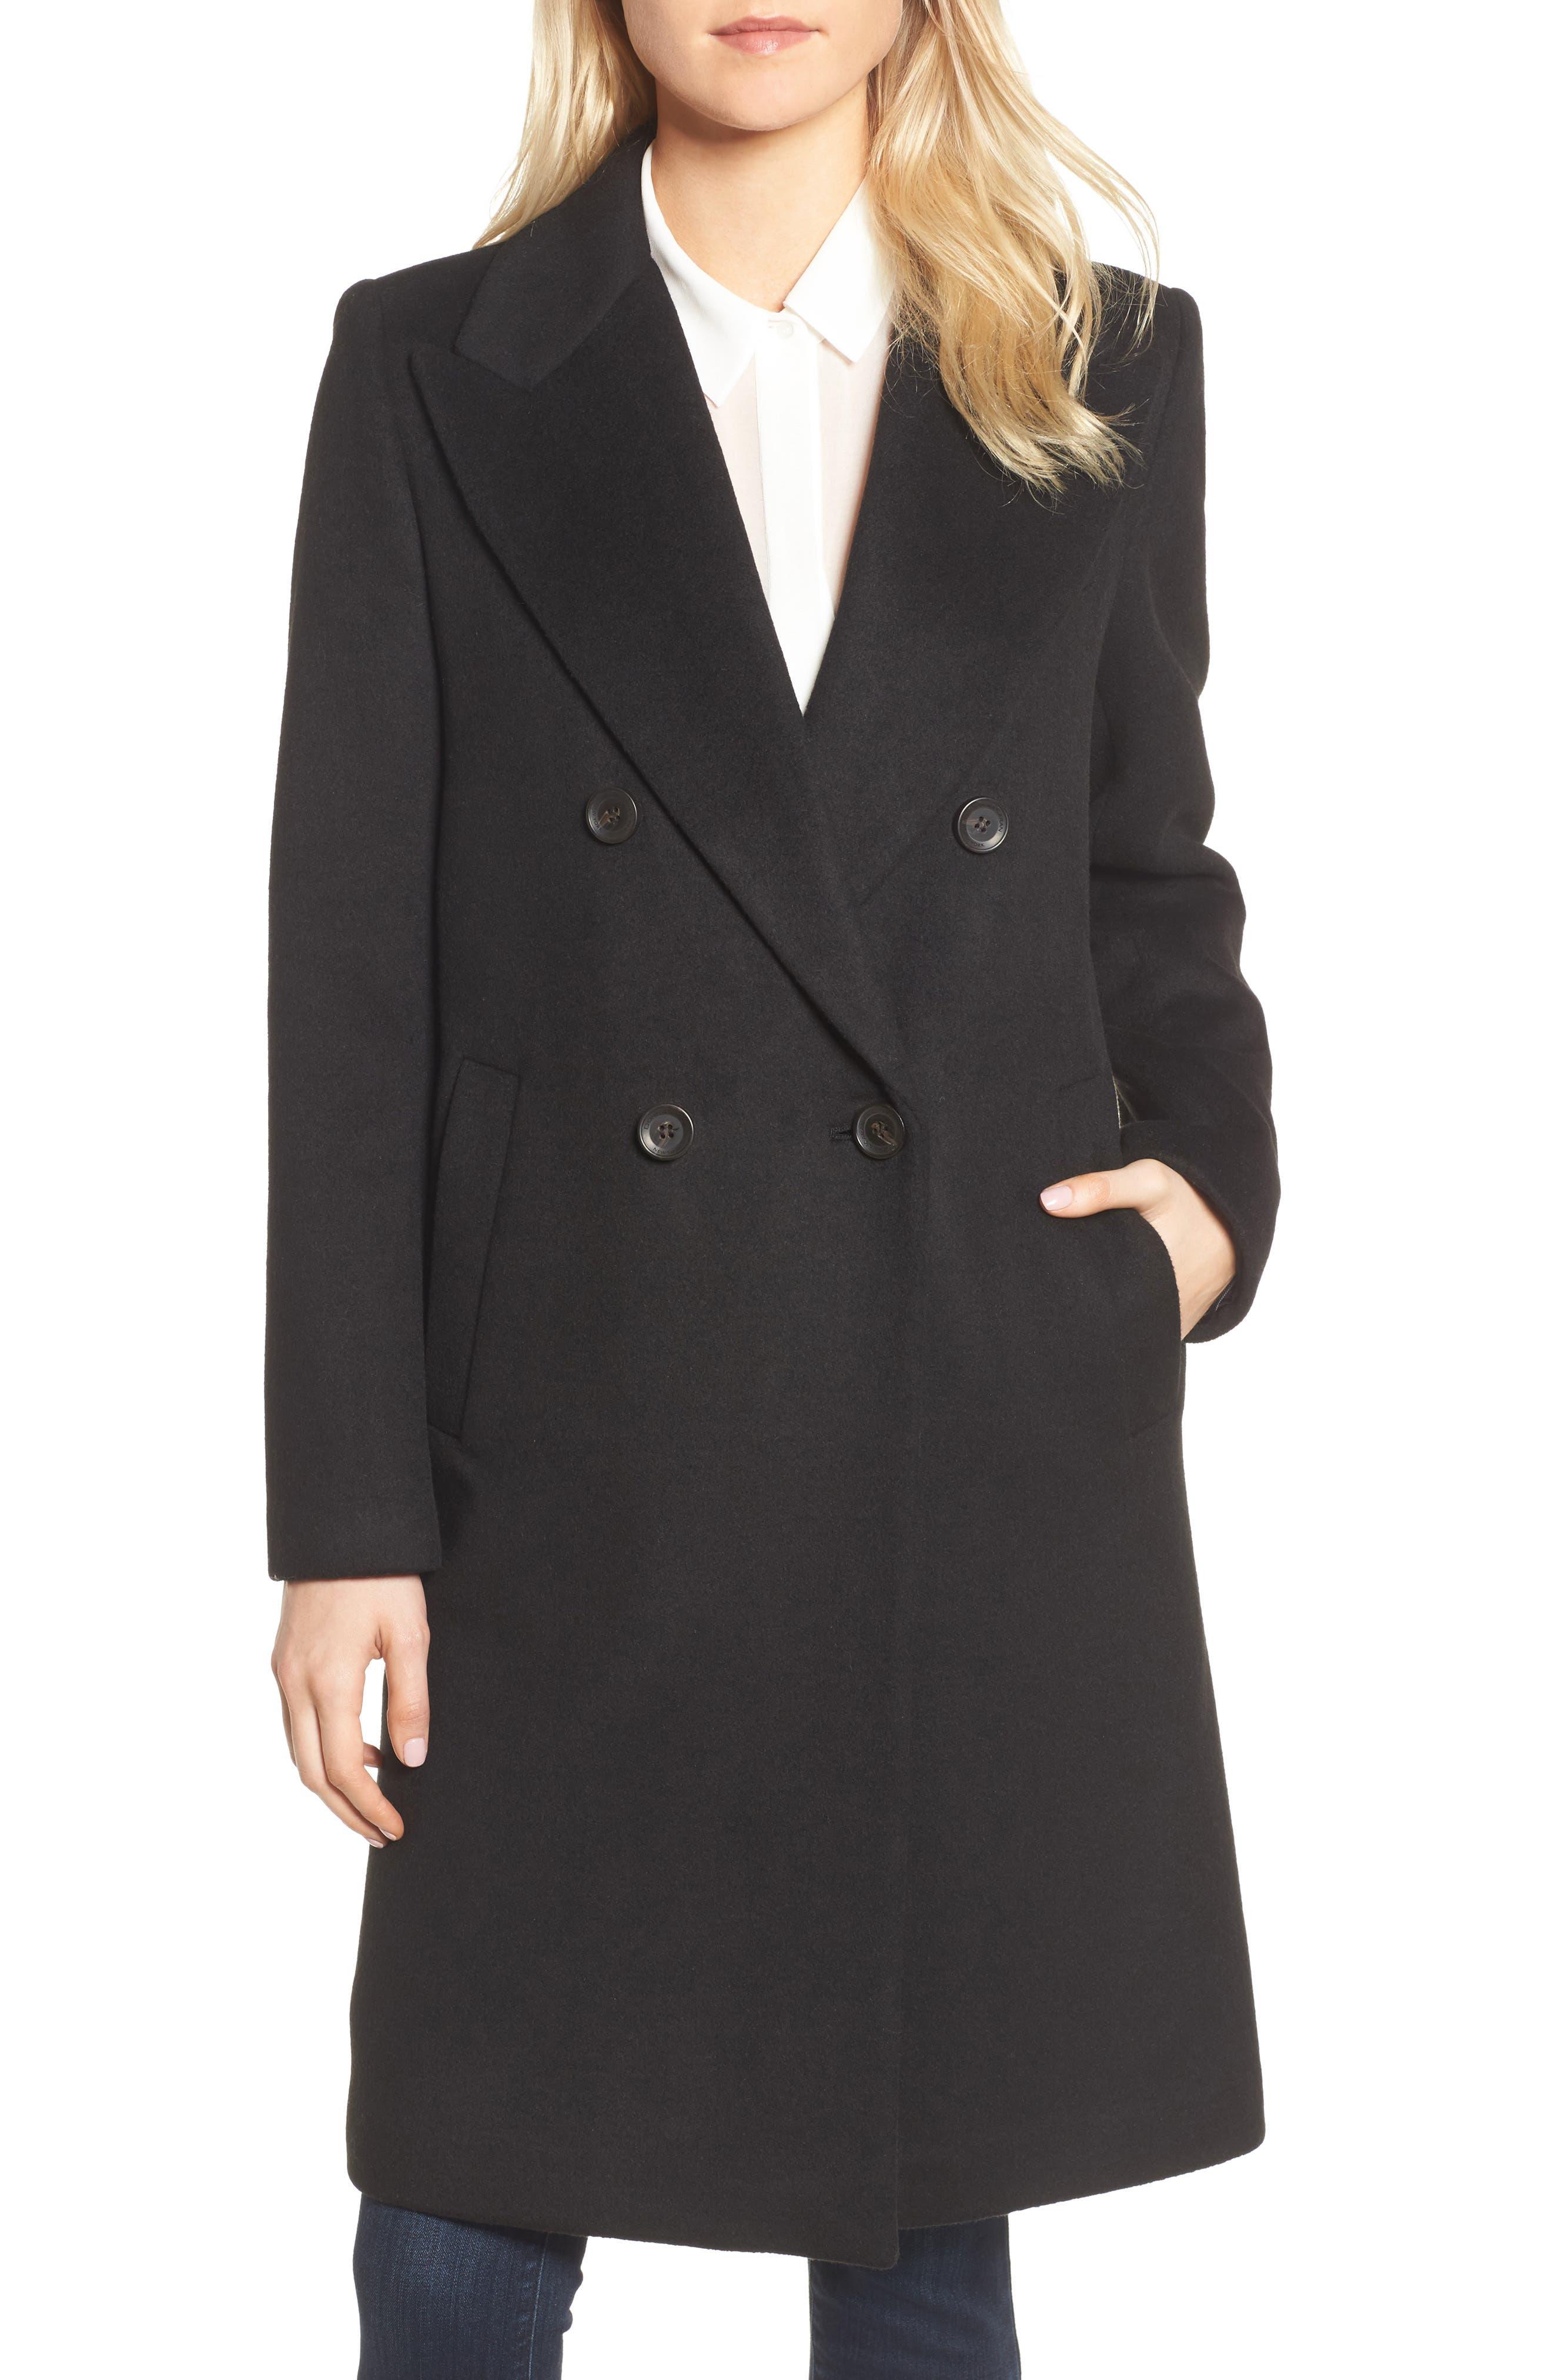 DKNY Lavish Wool Blend Coat,                         Main,                         color, 001